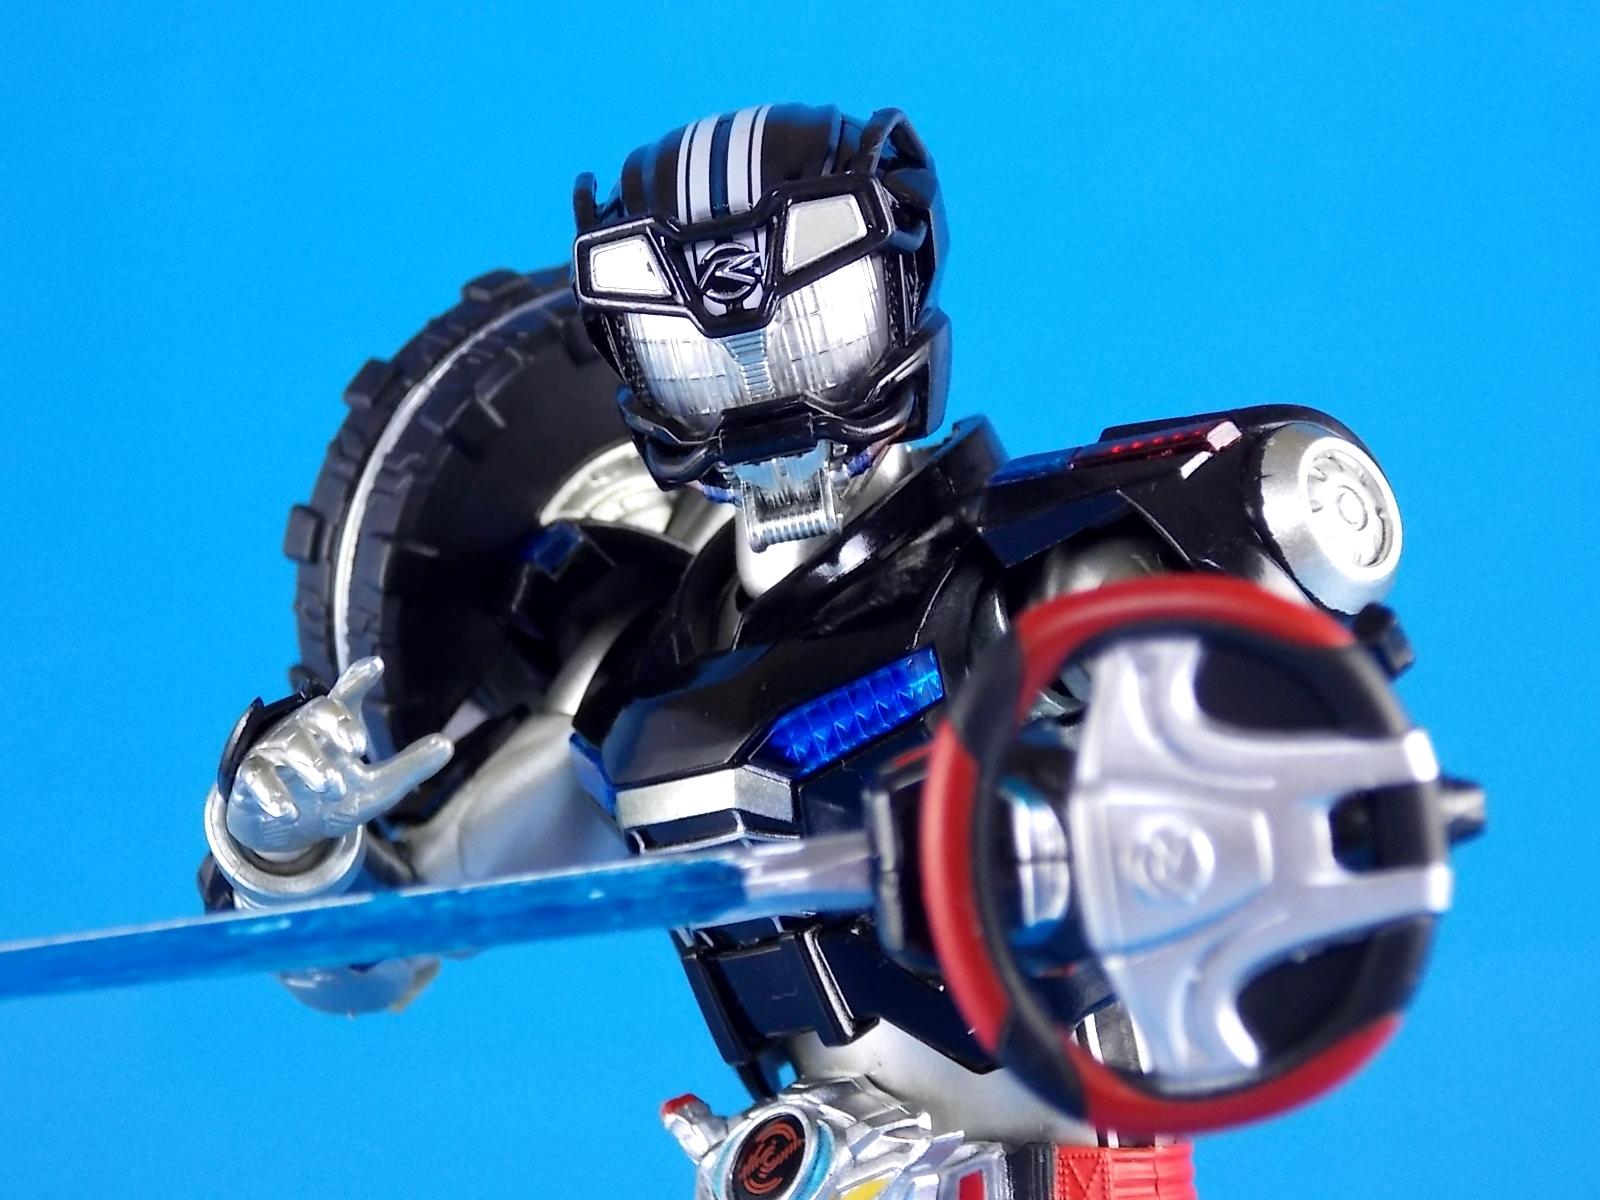 Toys, Hobbies Figuarts Kamen Rider Drive Type Wild Anime & Manga Useful Bandai Tamashii Nations S.h